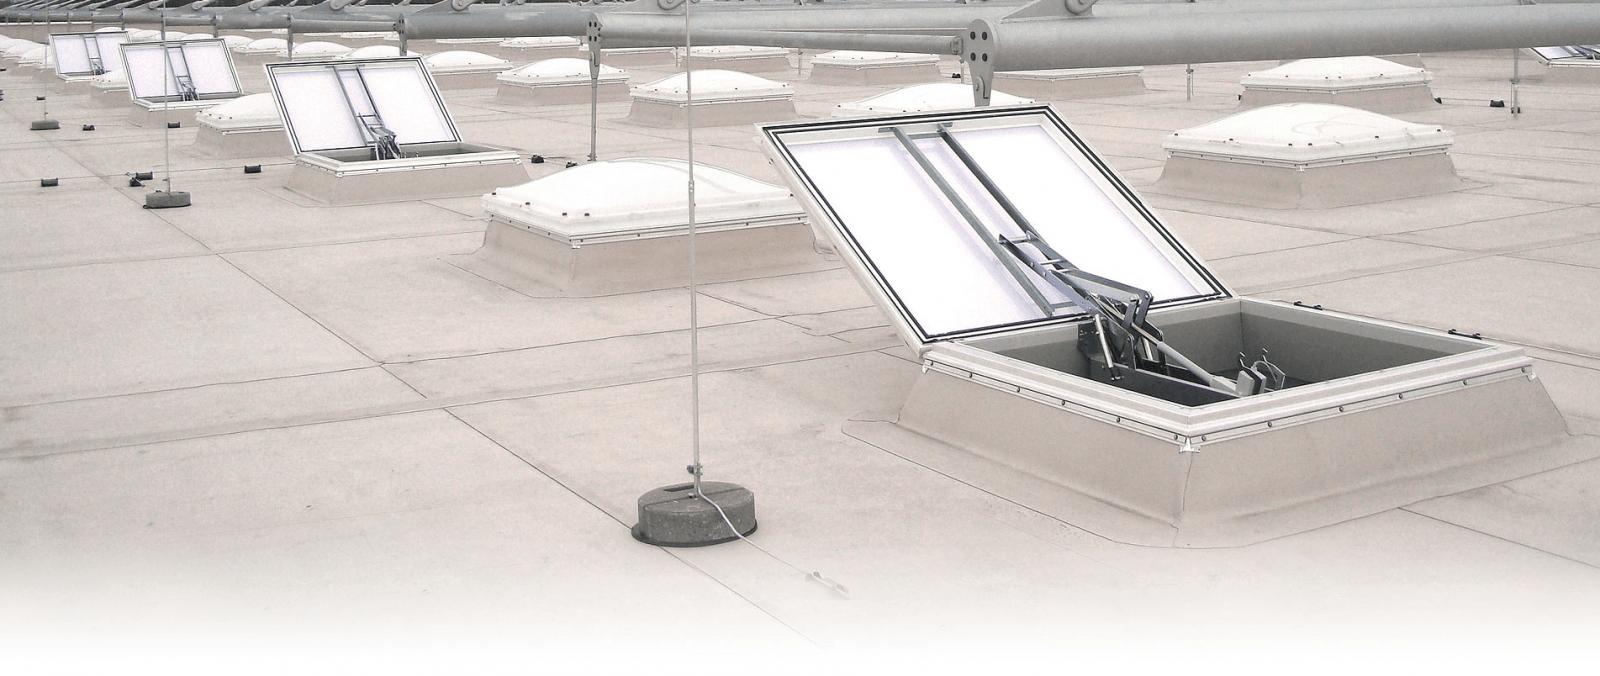 Larex Global Floor header tehnologie 24/48 volt